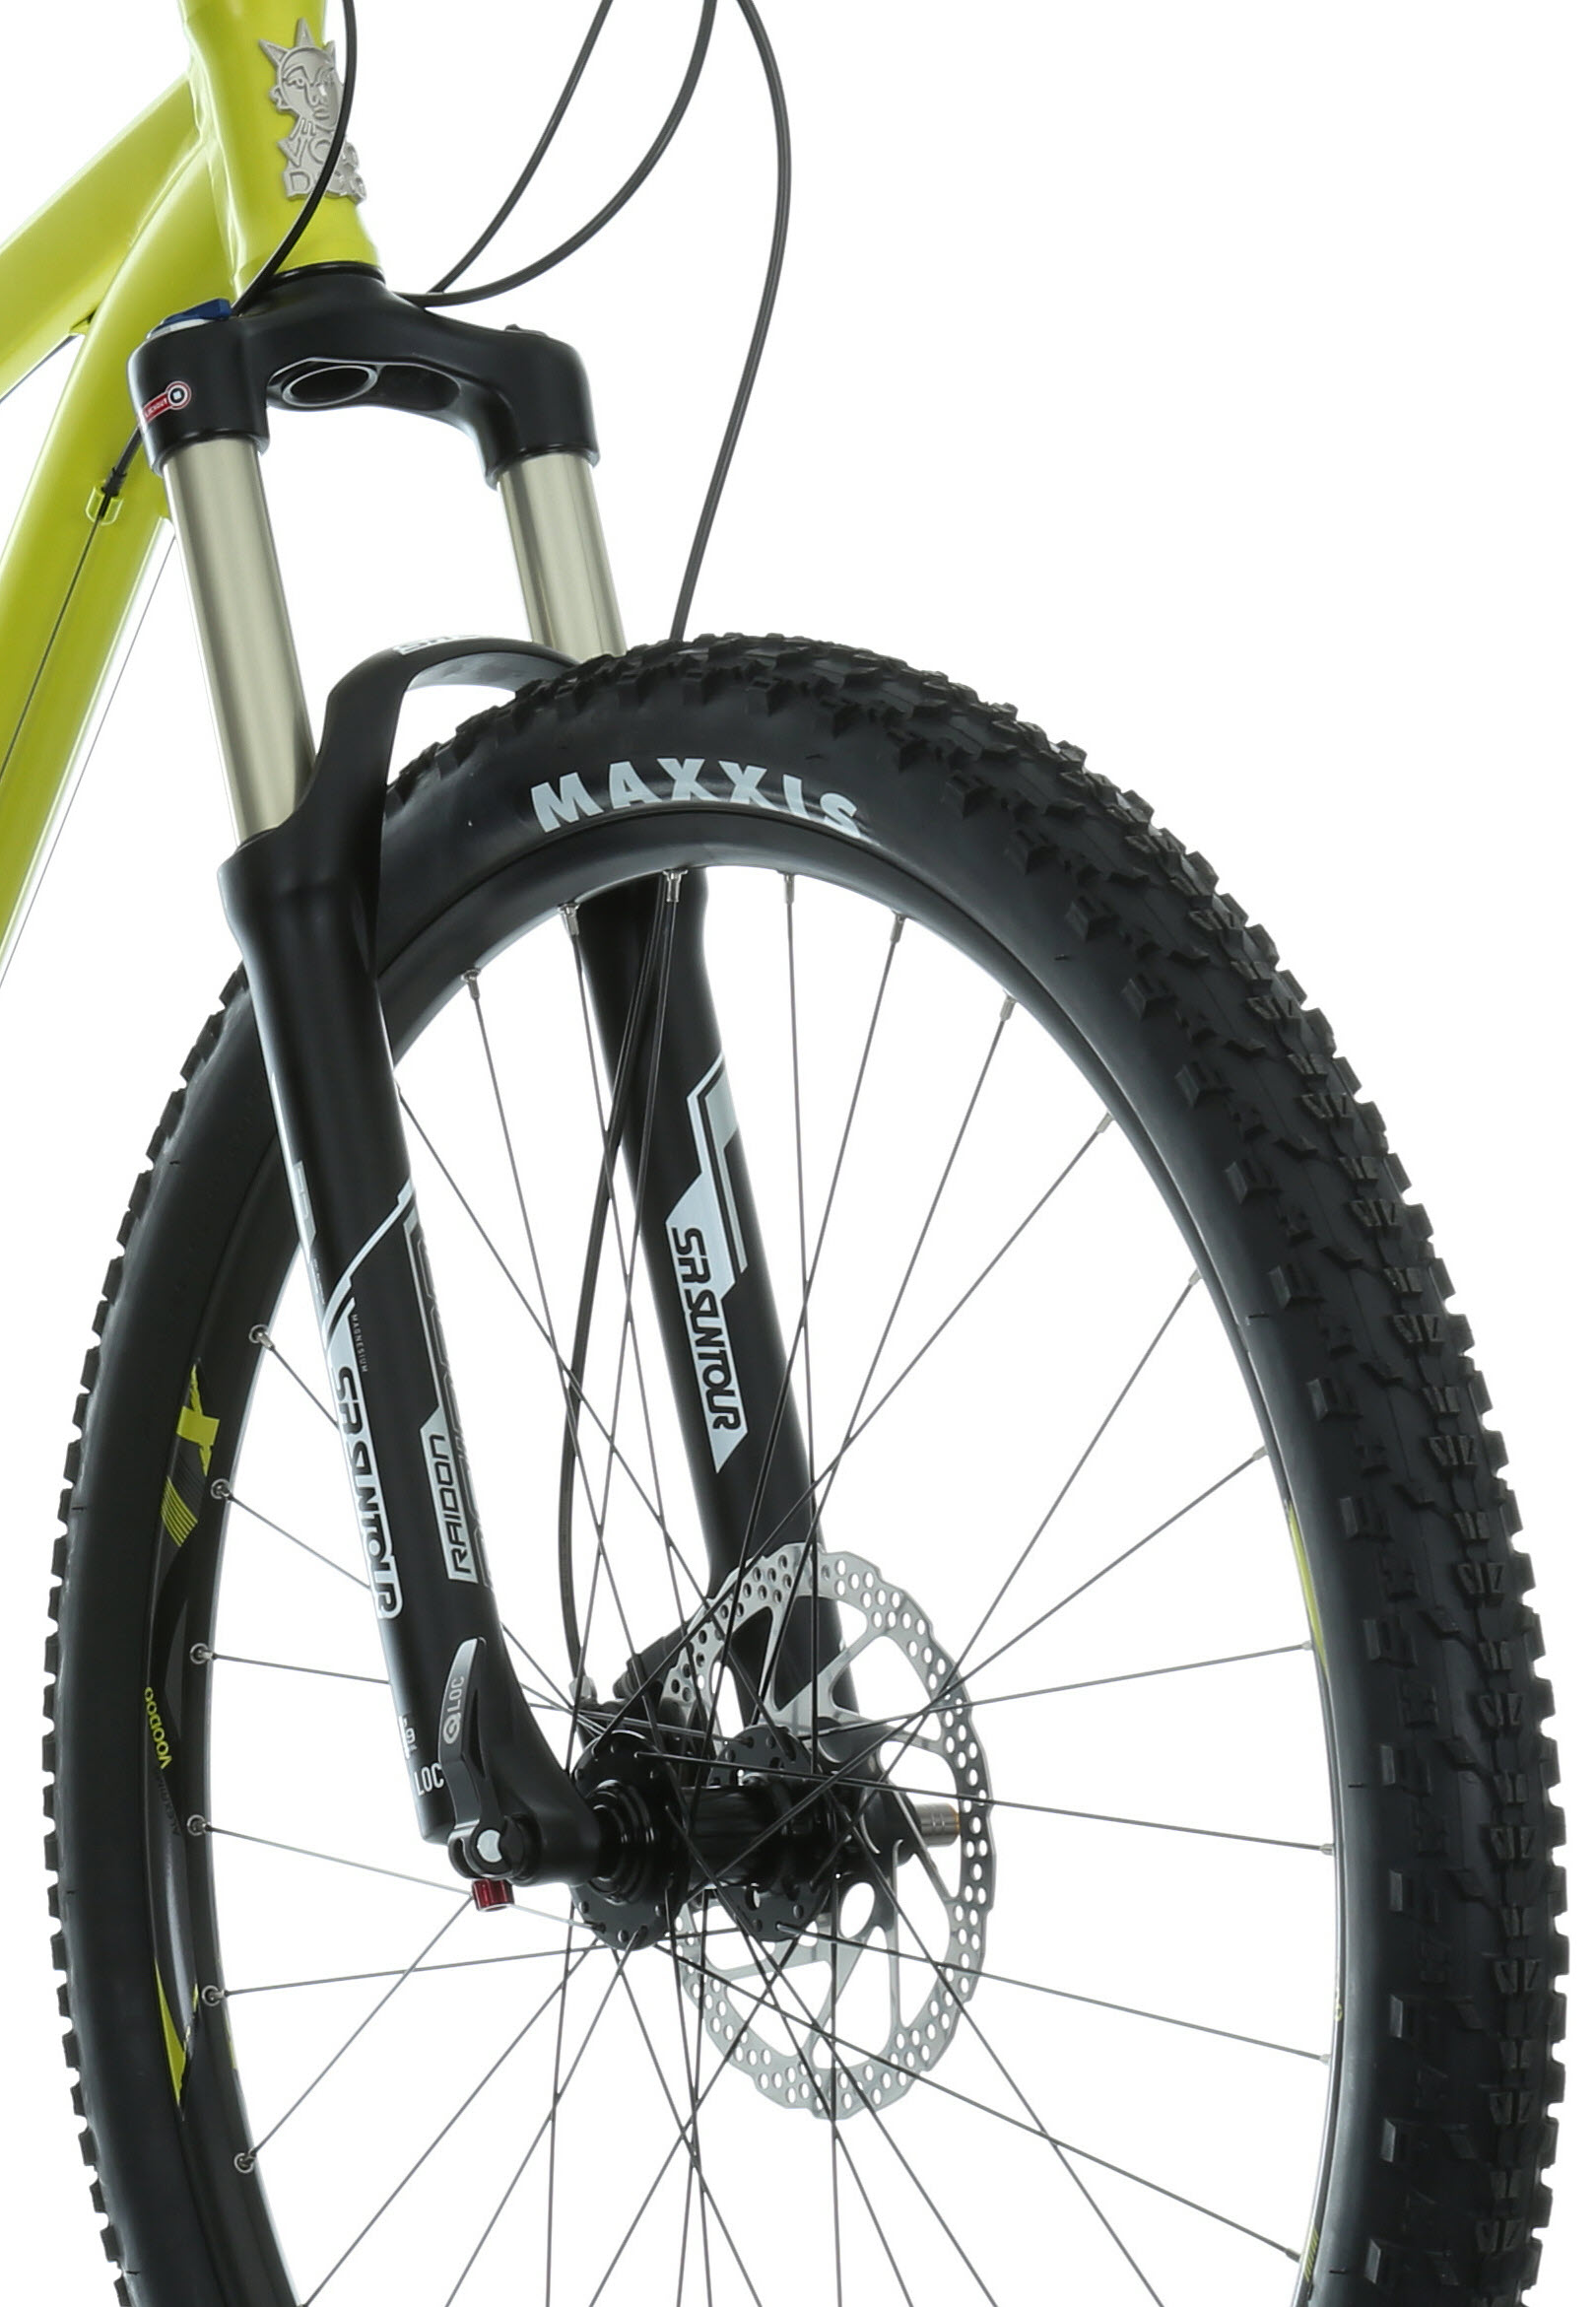 Bizango front wheel